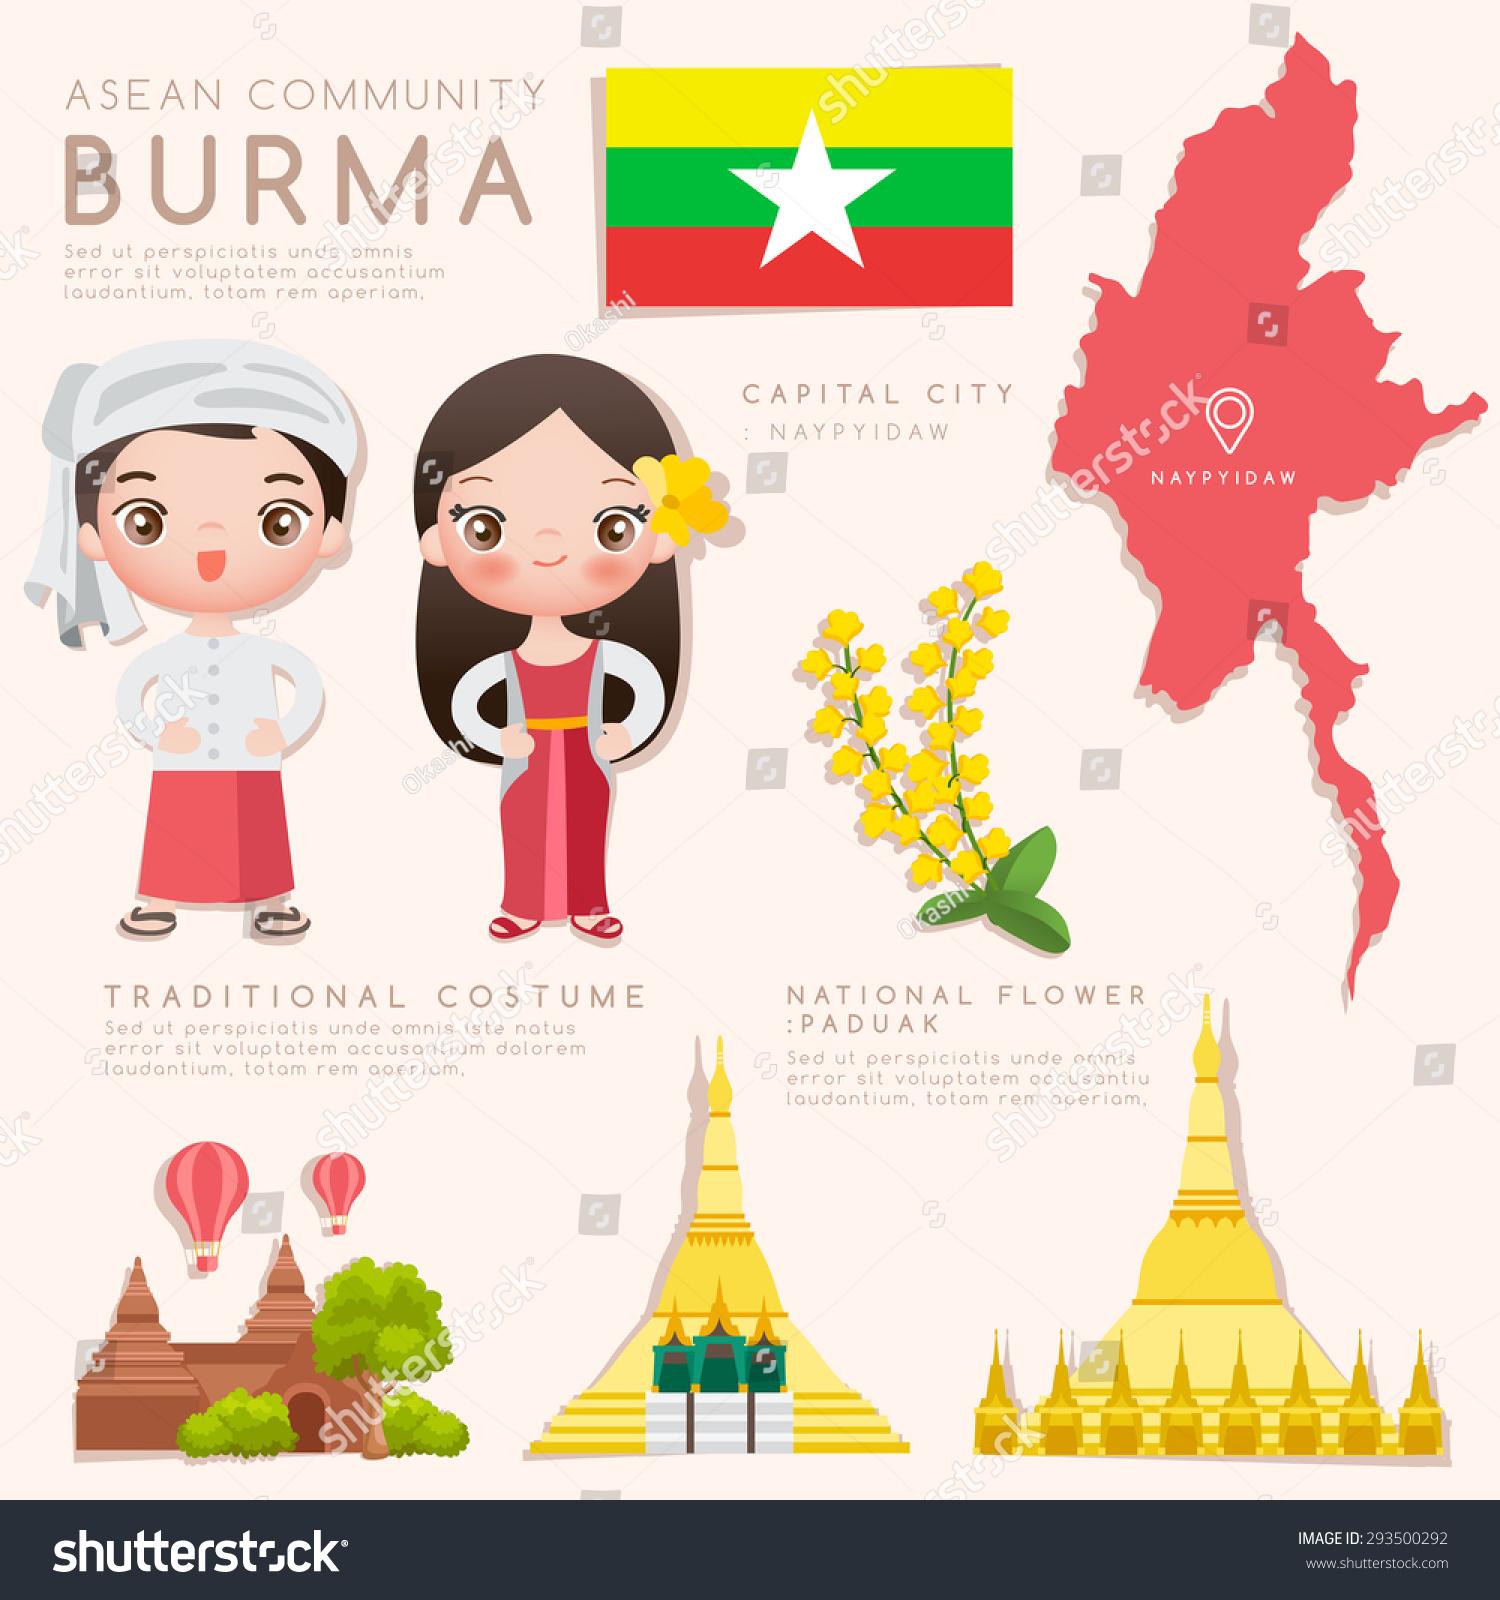 burma asean economic community aec infographic stock